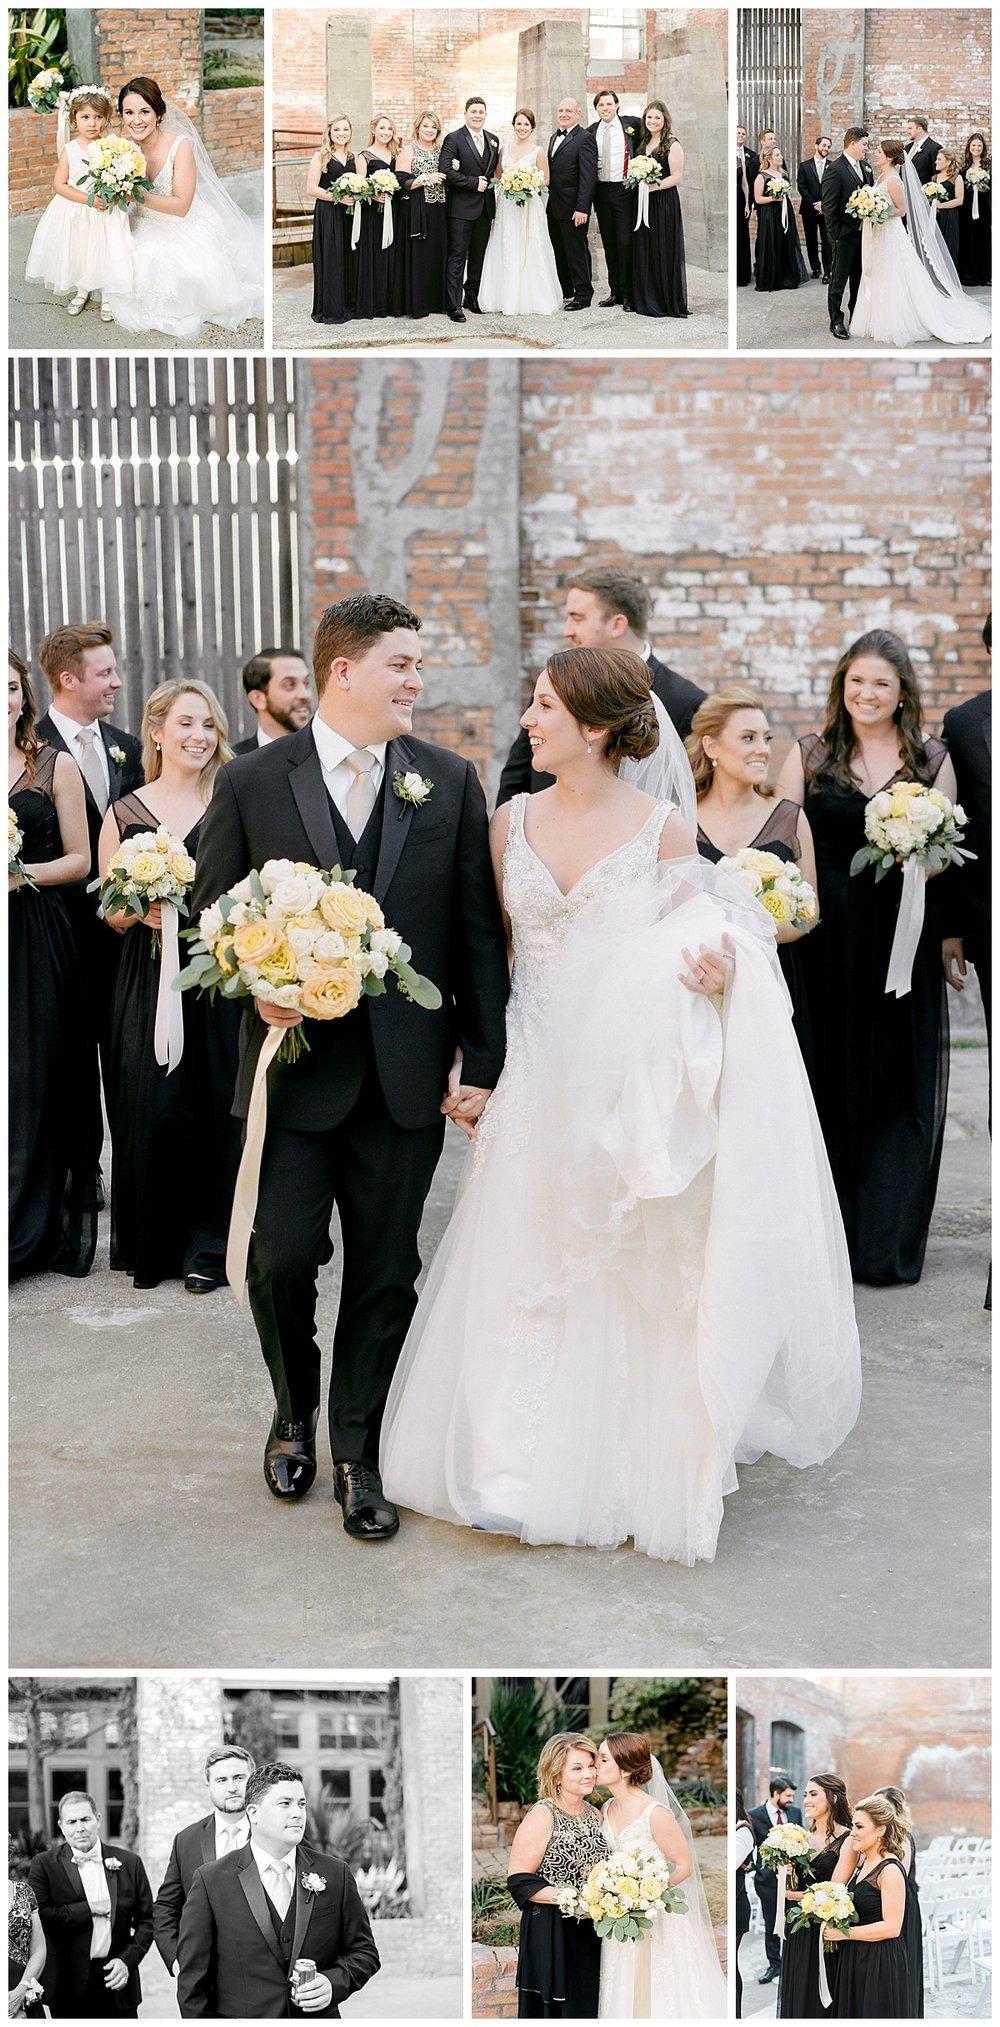 the-cotton-mill-wedding-ar-photography-12.jpg